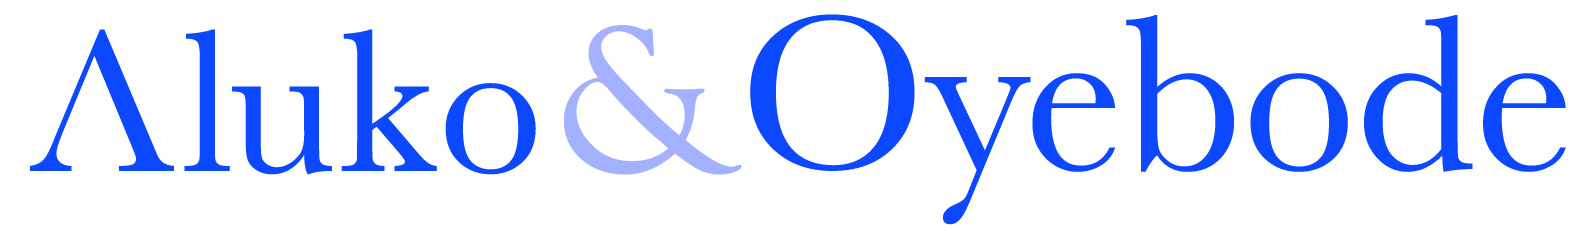 A&O_Logo.jpg